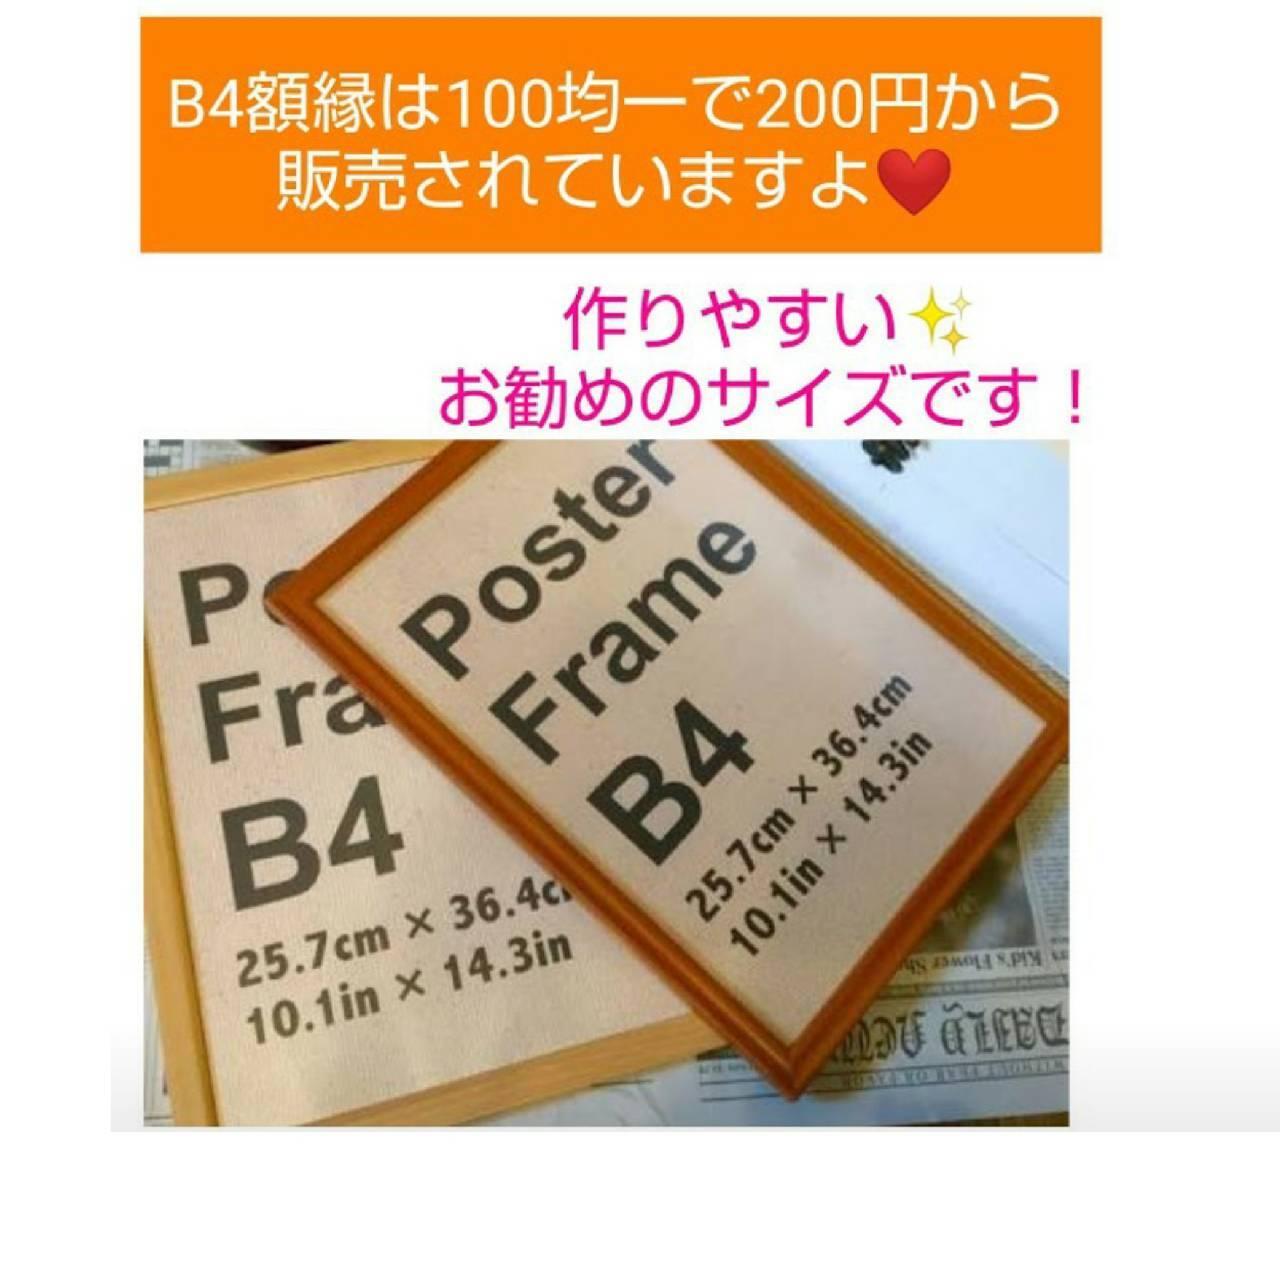 B4:四角【s10555】フルダイヤモンドアート✨